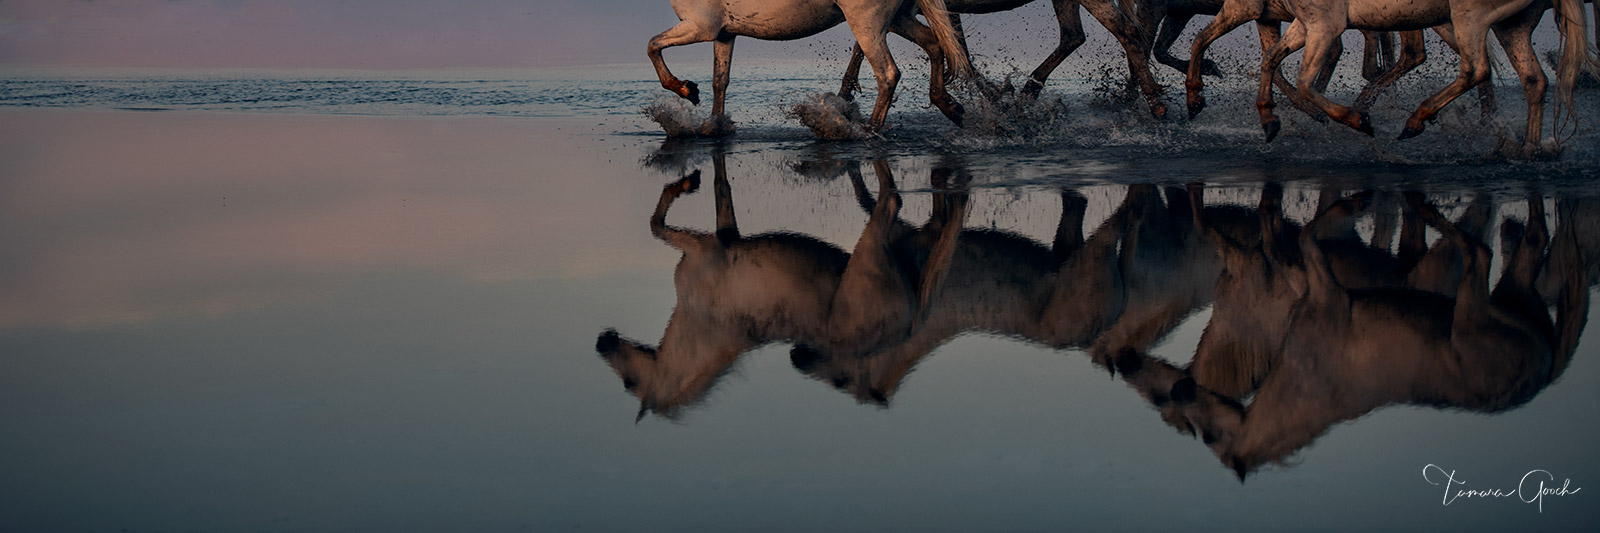 horse, horses, horse photos, horse photographer, horse photography, photographer, Idaho, equine, equine photography, equine photographer, Idaho equine photographers, equestrian, lifestyle, workshops, , photo